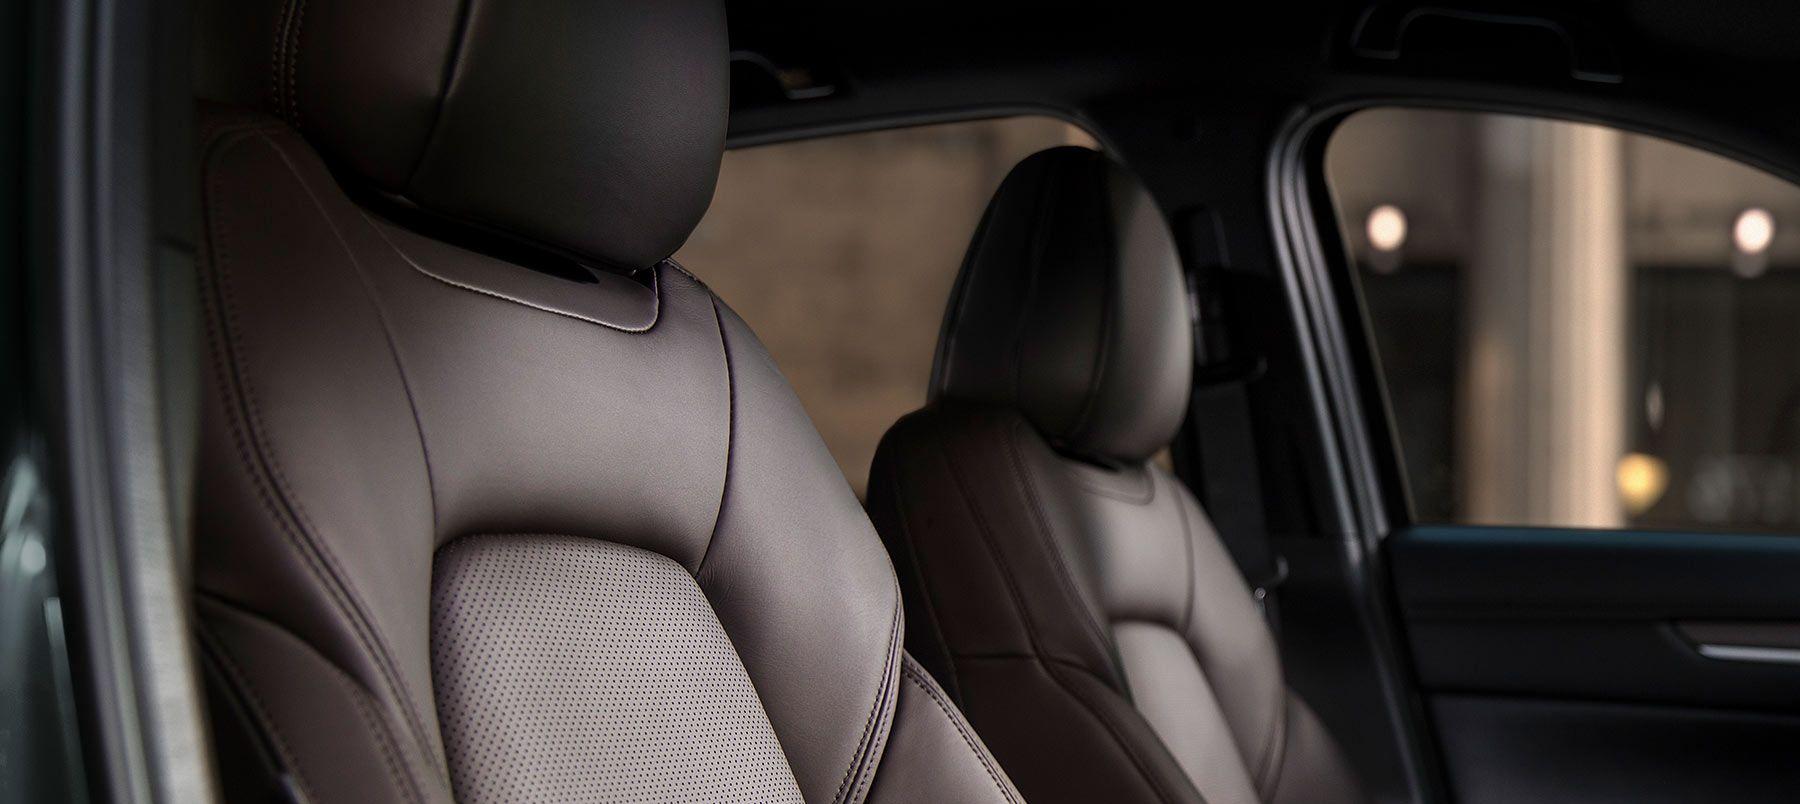 Plush Seating in the 2019 Mazda CX-5